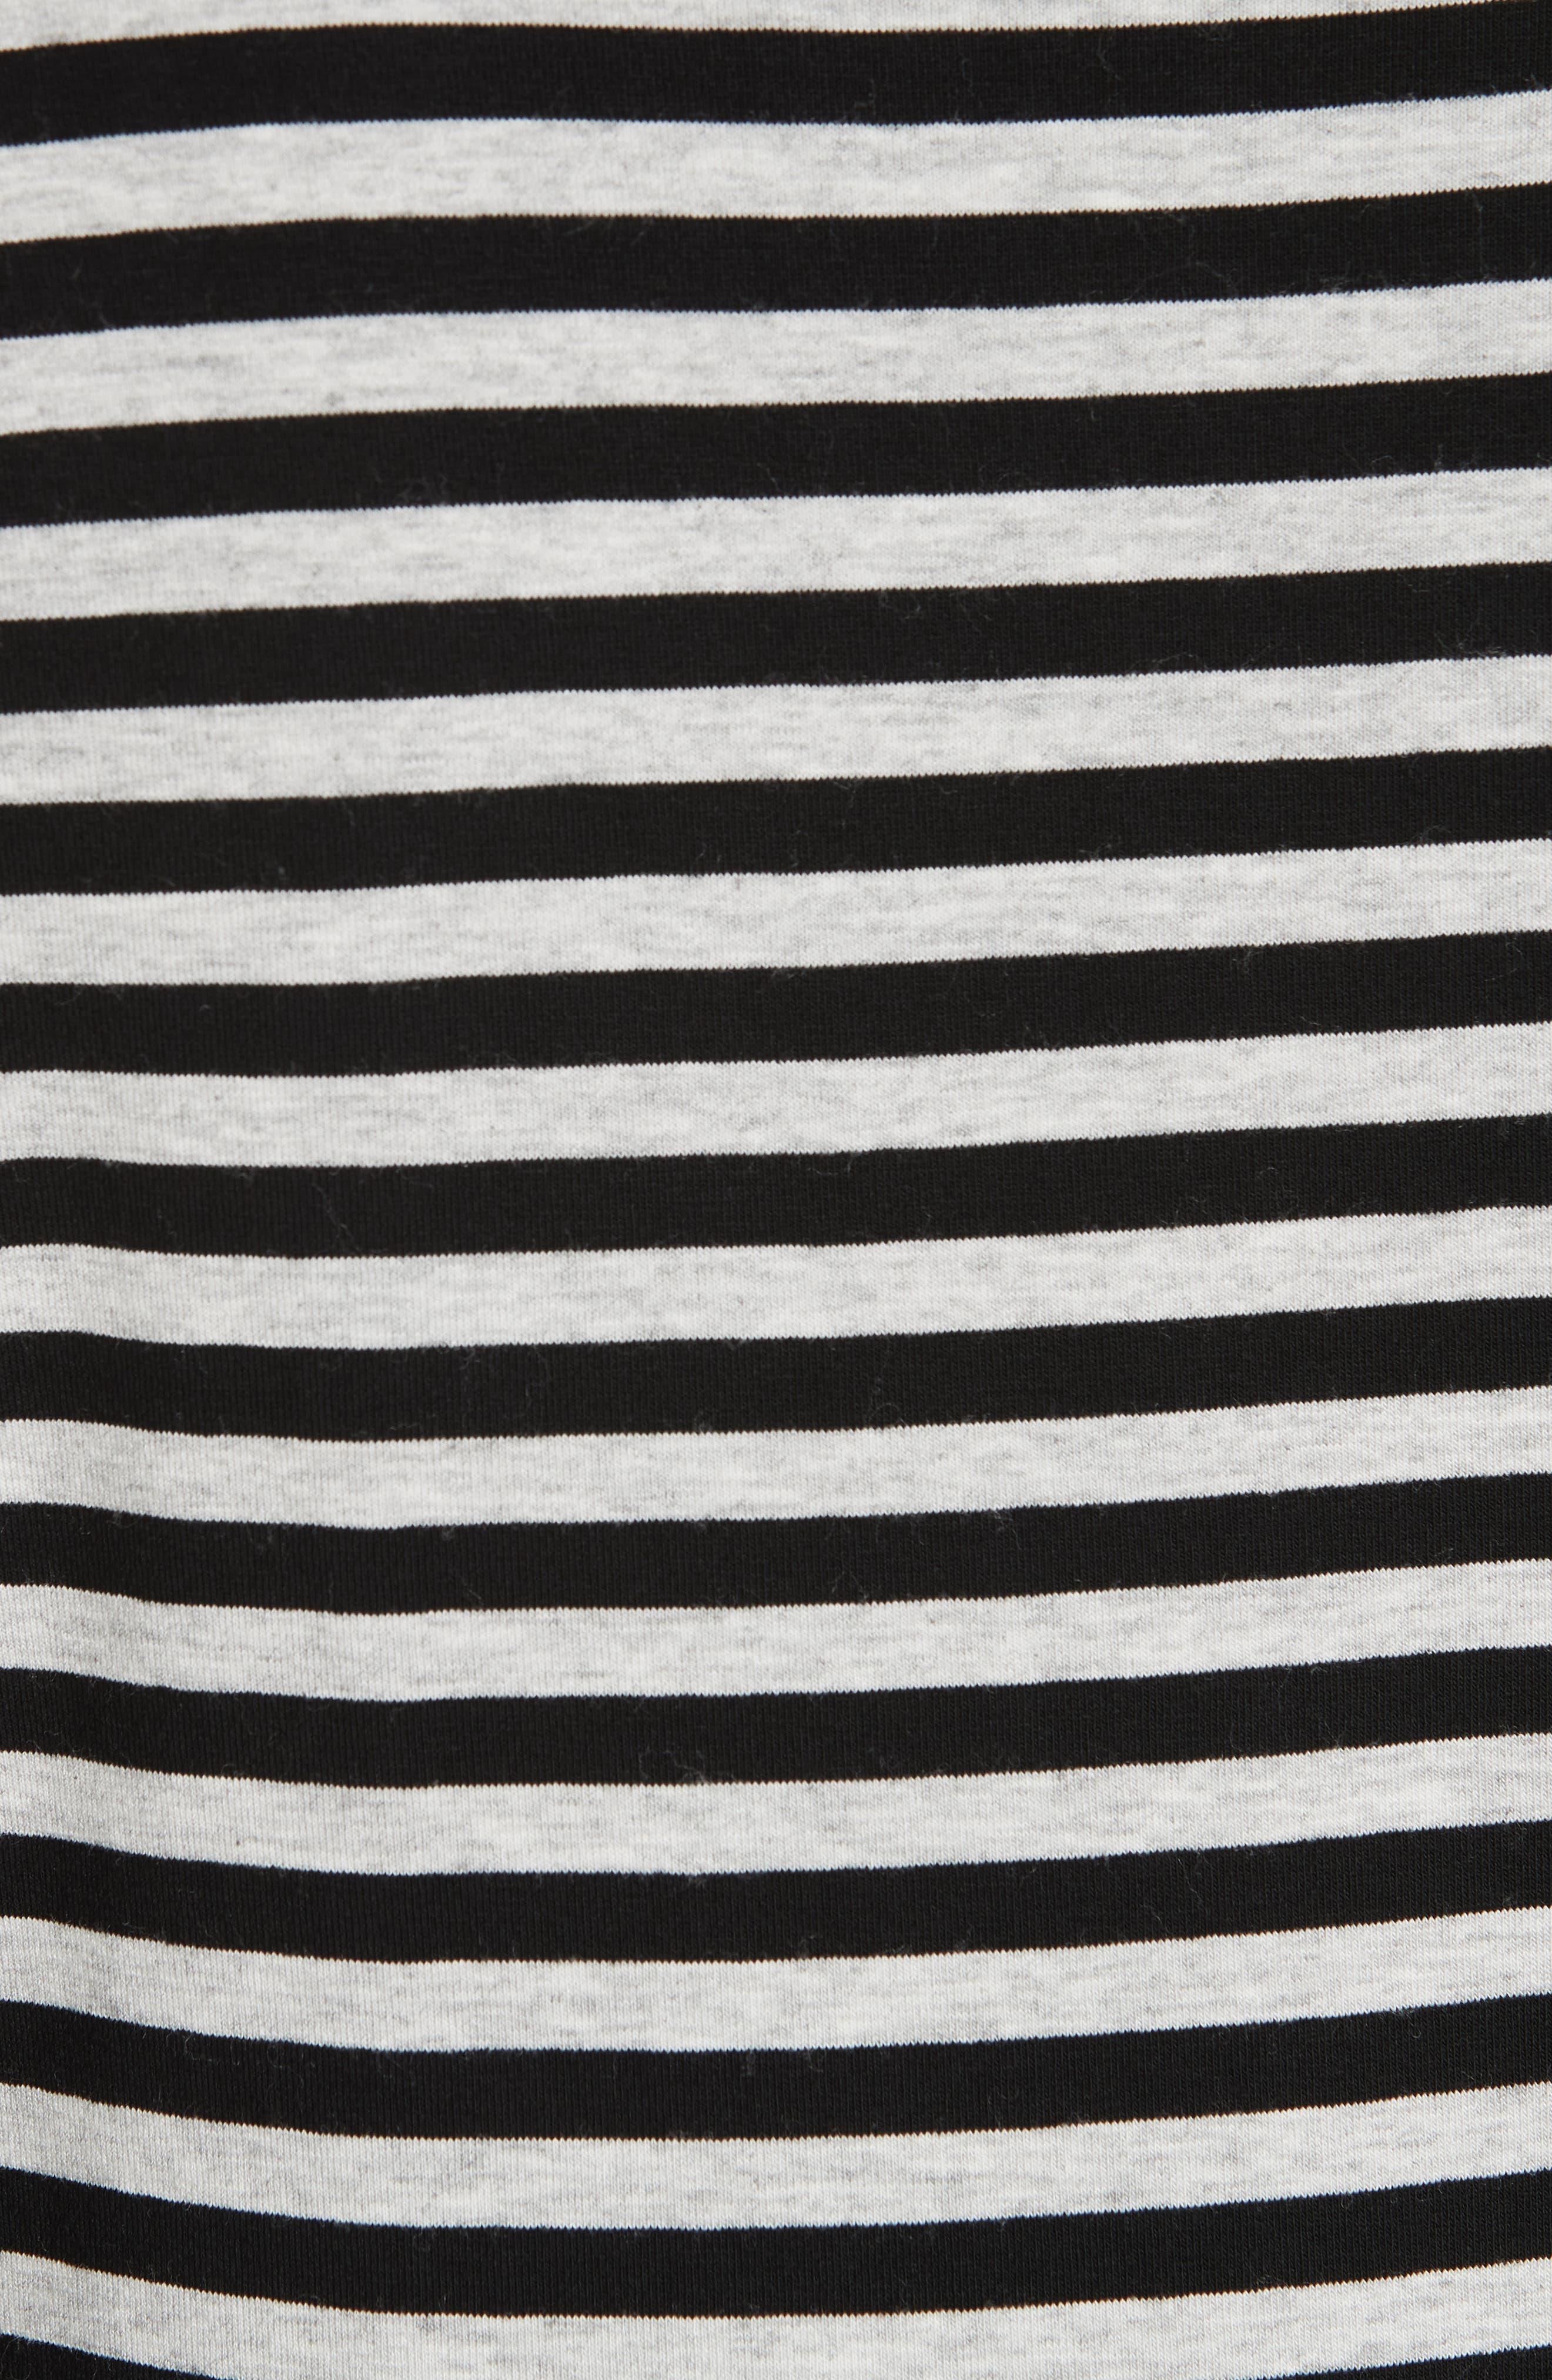 Stripe Top,                             Alternate thumbnail 5, color,                             HEATHER GREY- BLACK STRIPE